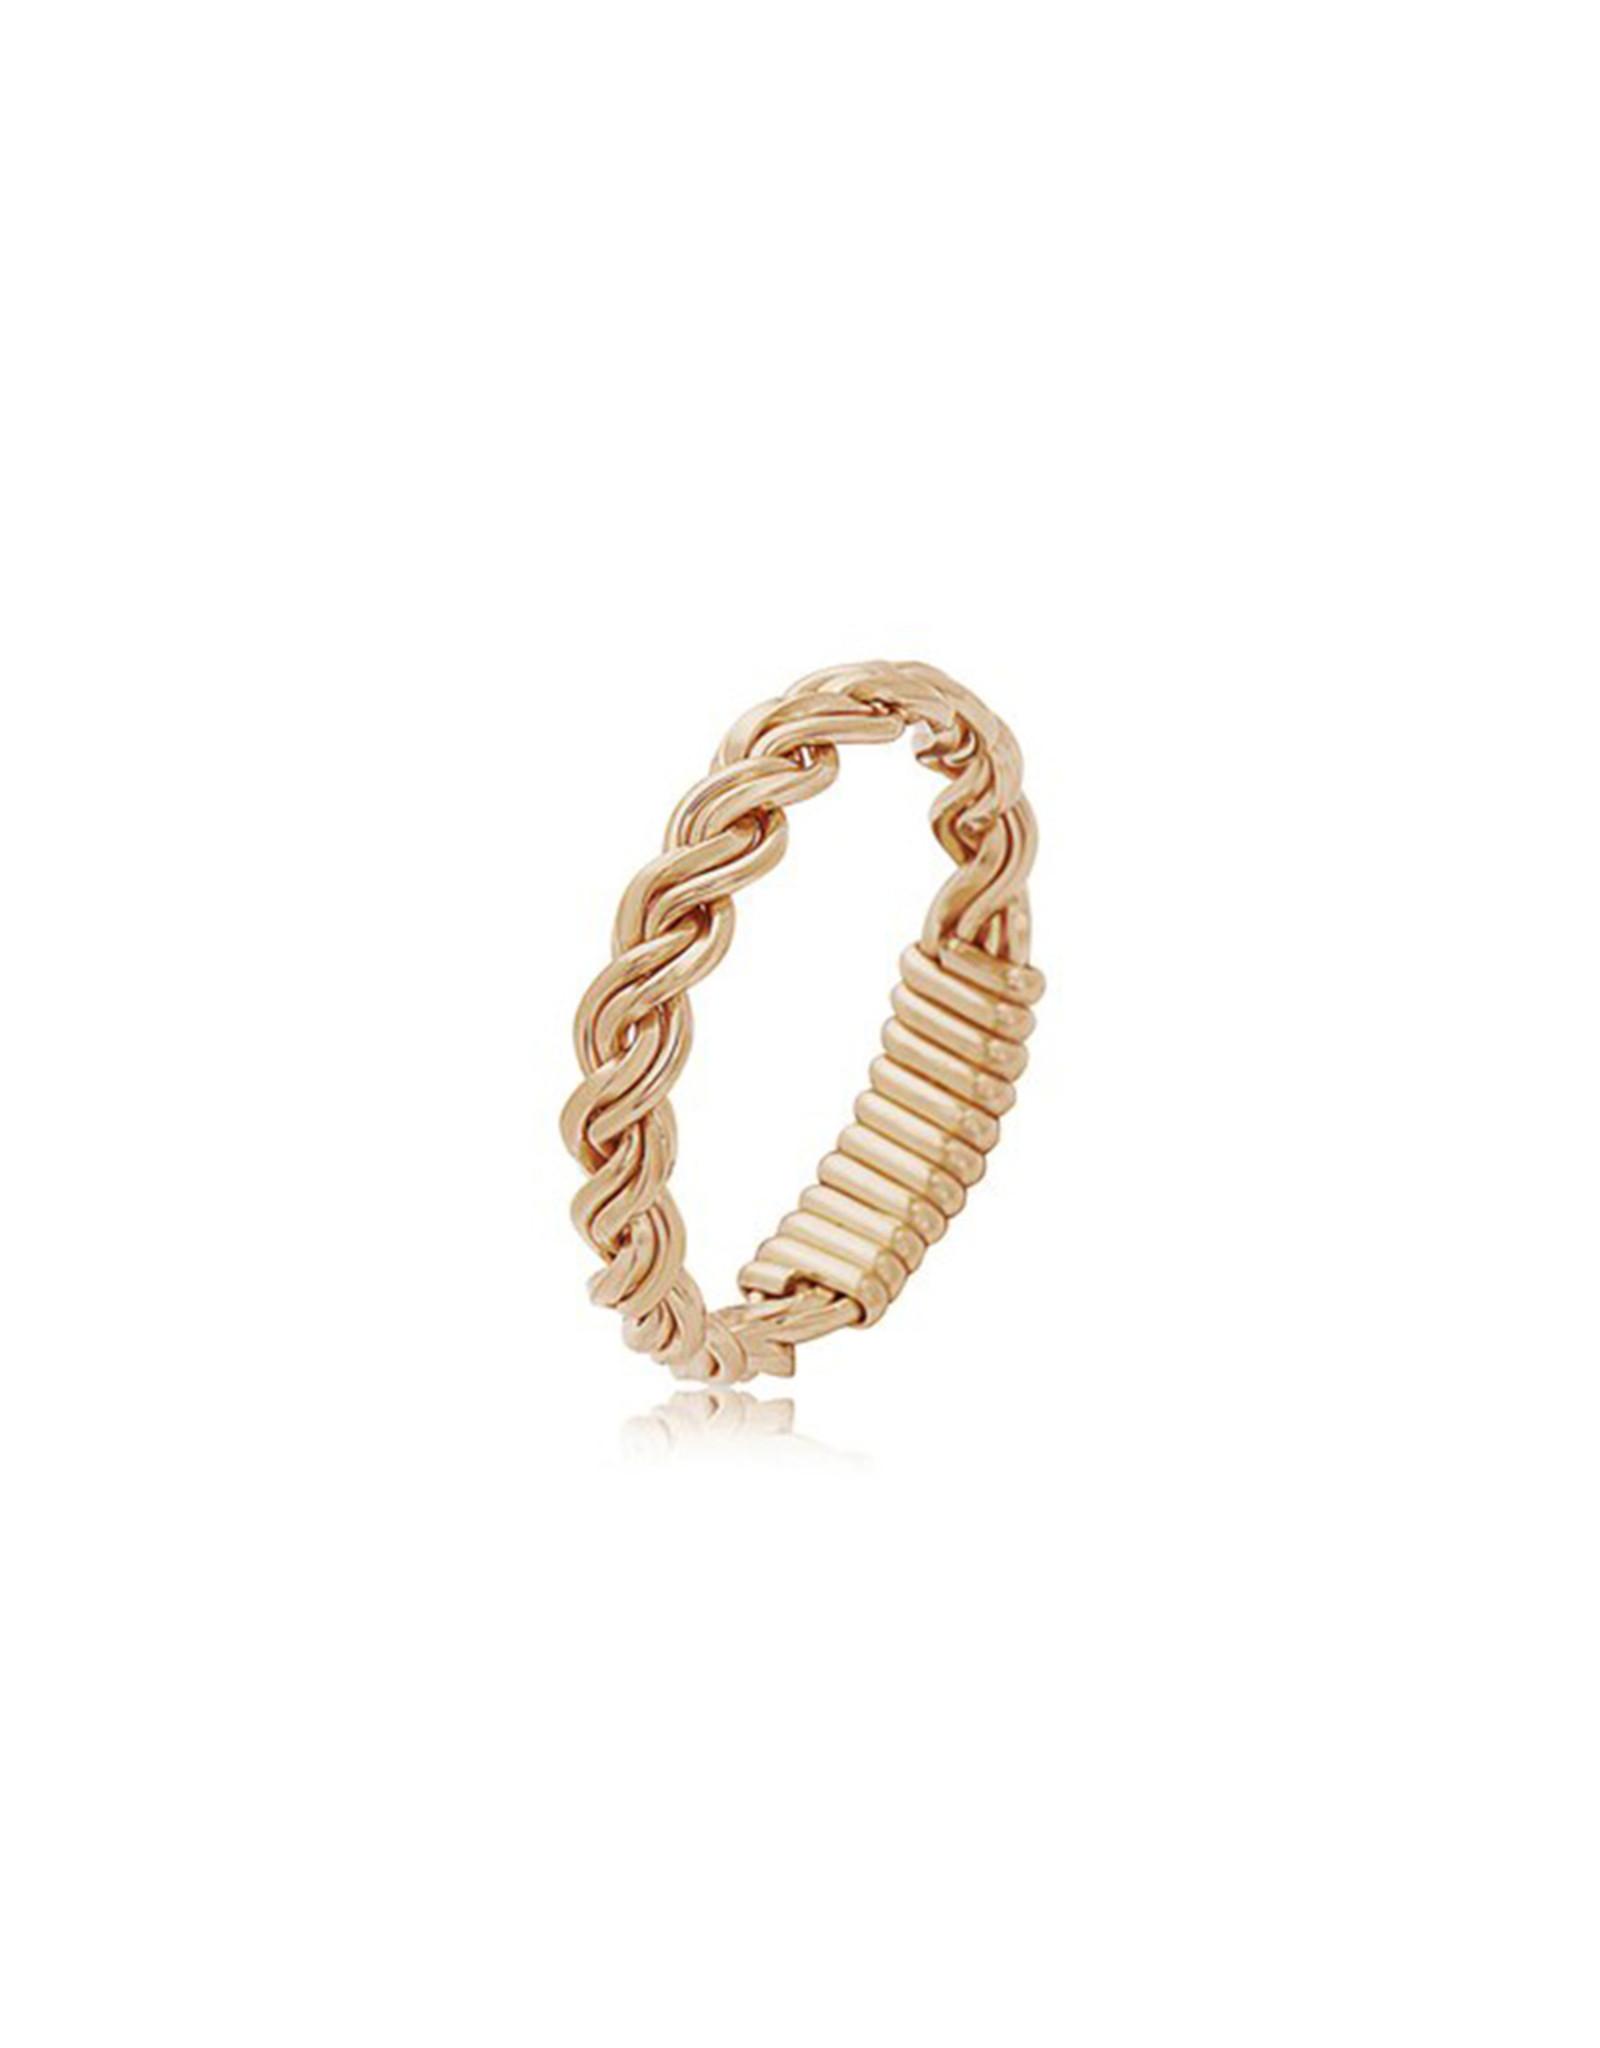 Ronaldo Ronaldo Love Knot Gold Ring